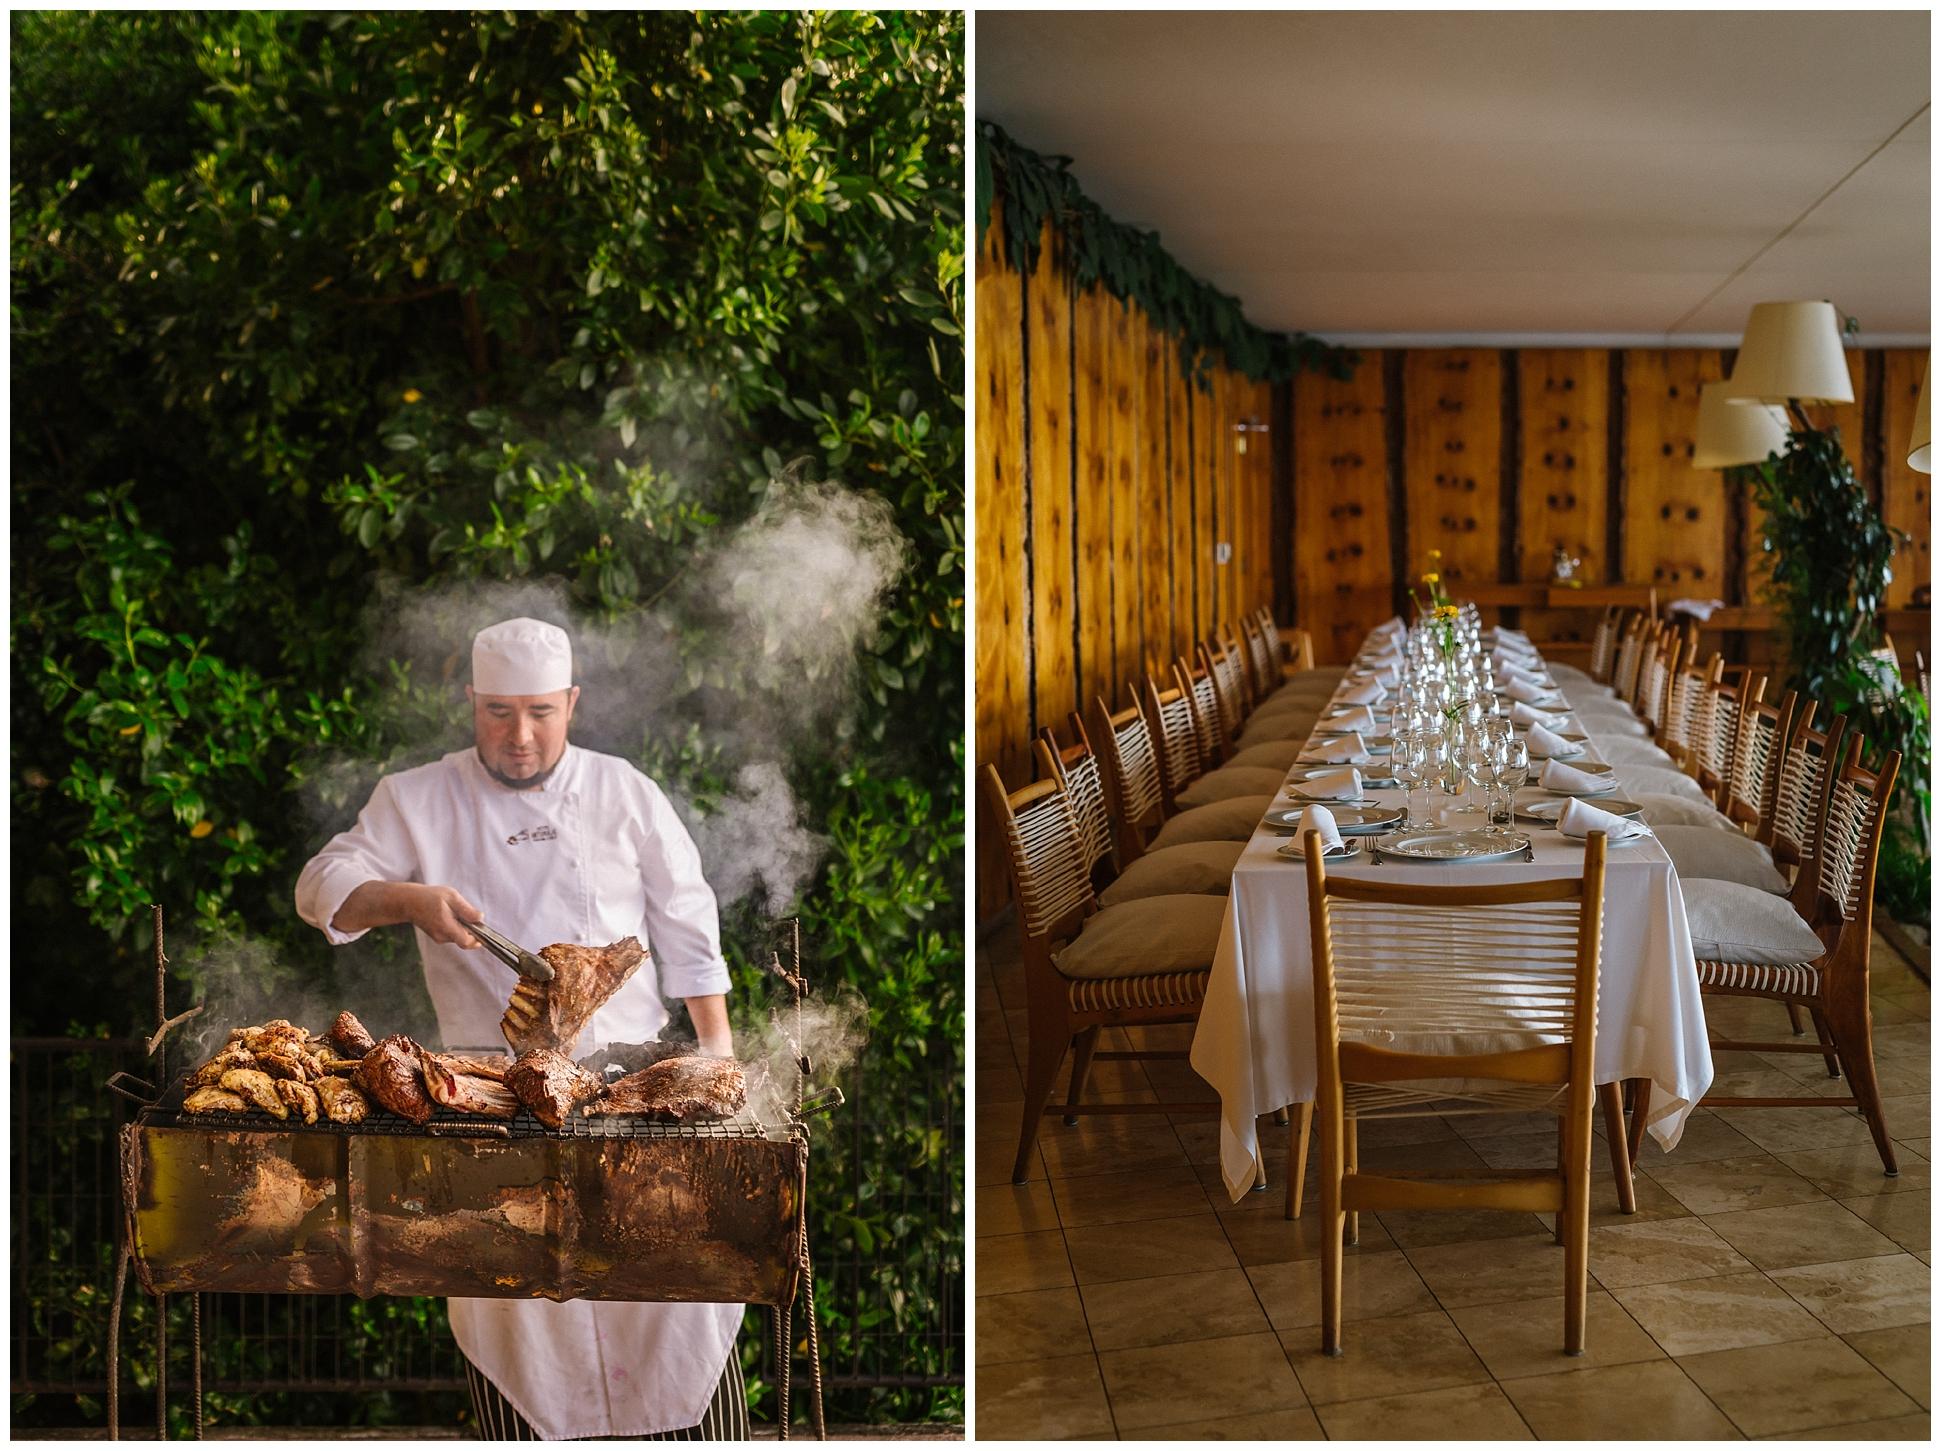 Cheilean-destination-adventure-wedding-florida-patagonia-pucon-santa-cruz-vsco_0017.jpg